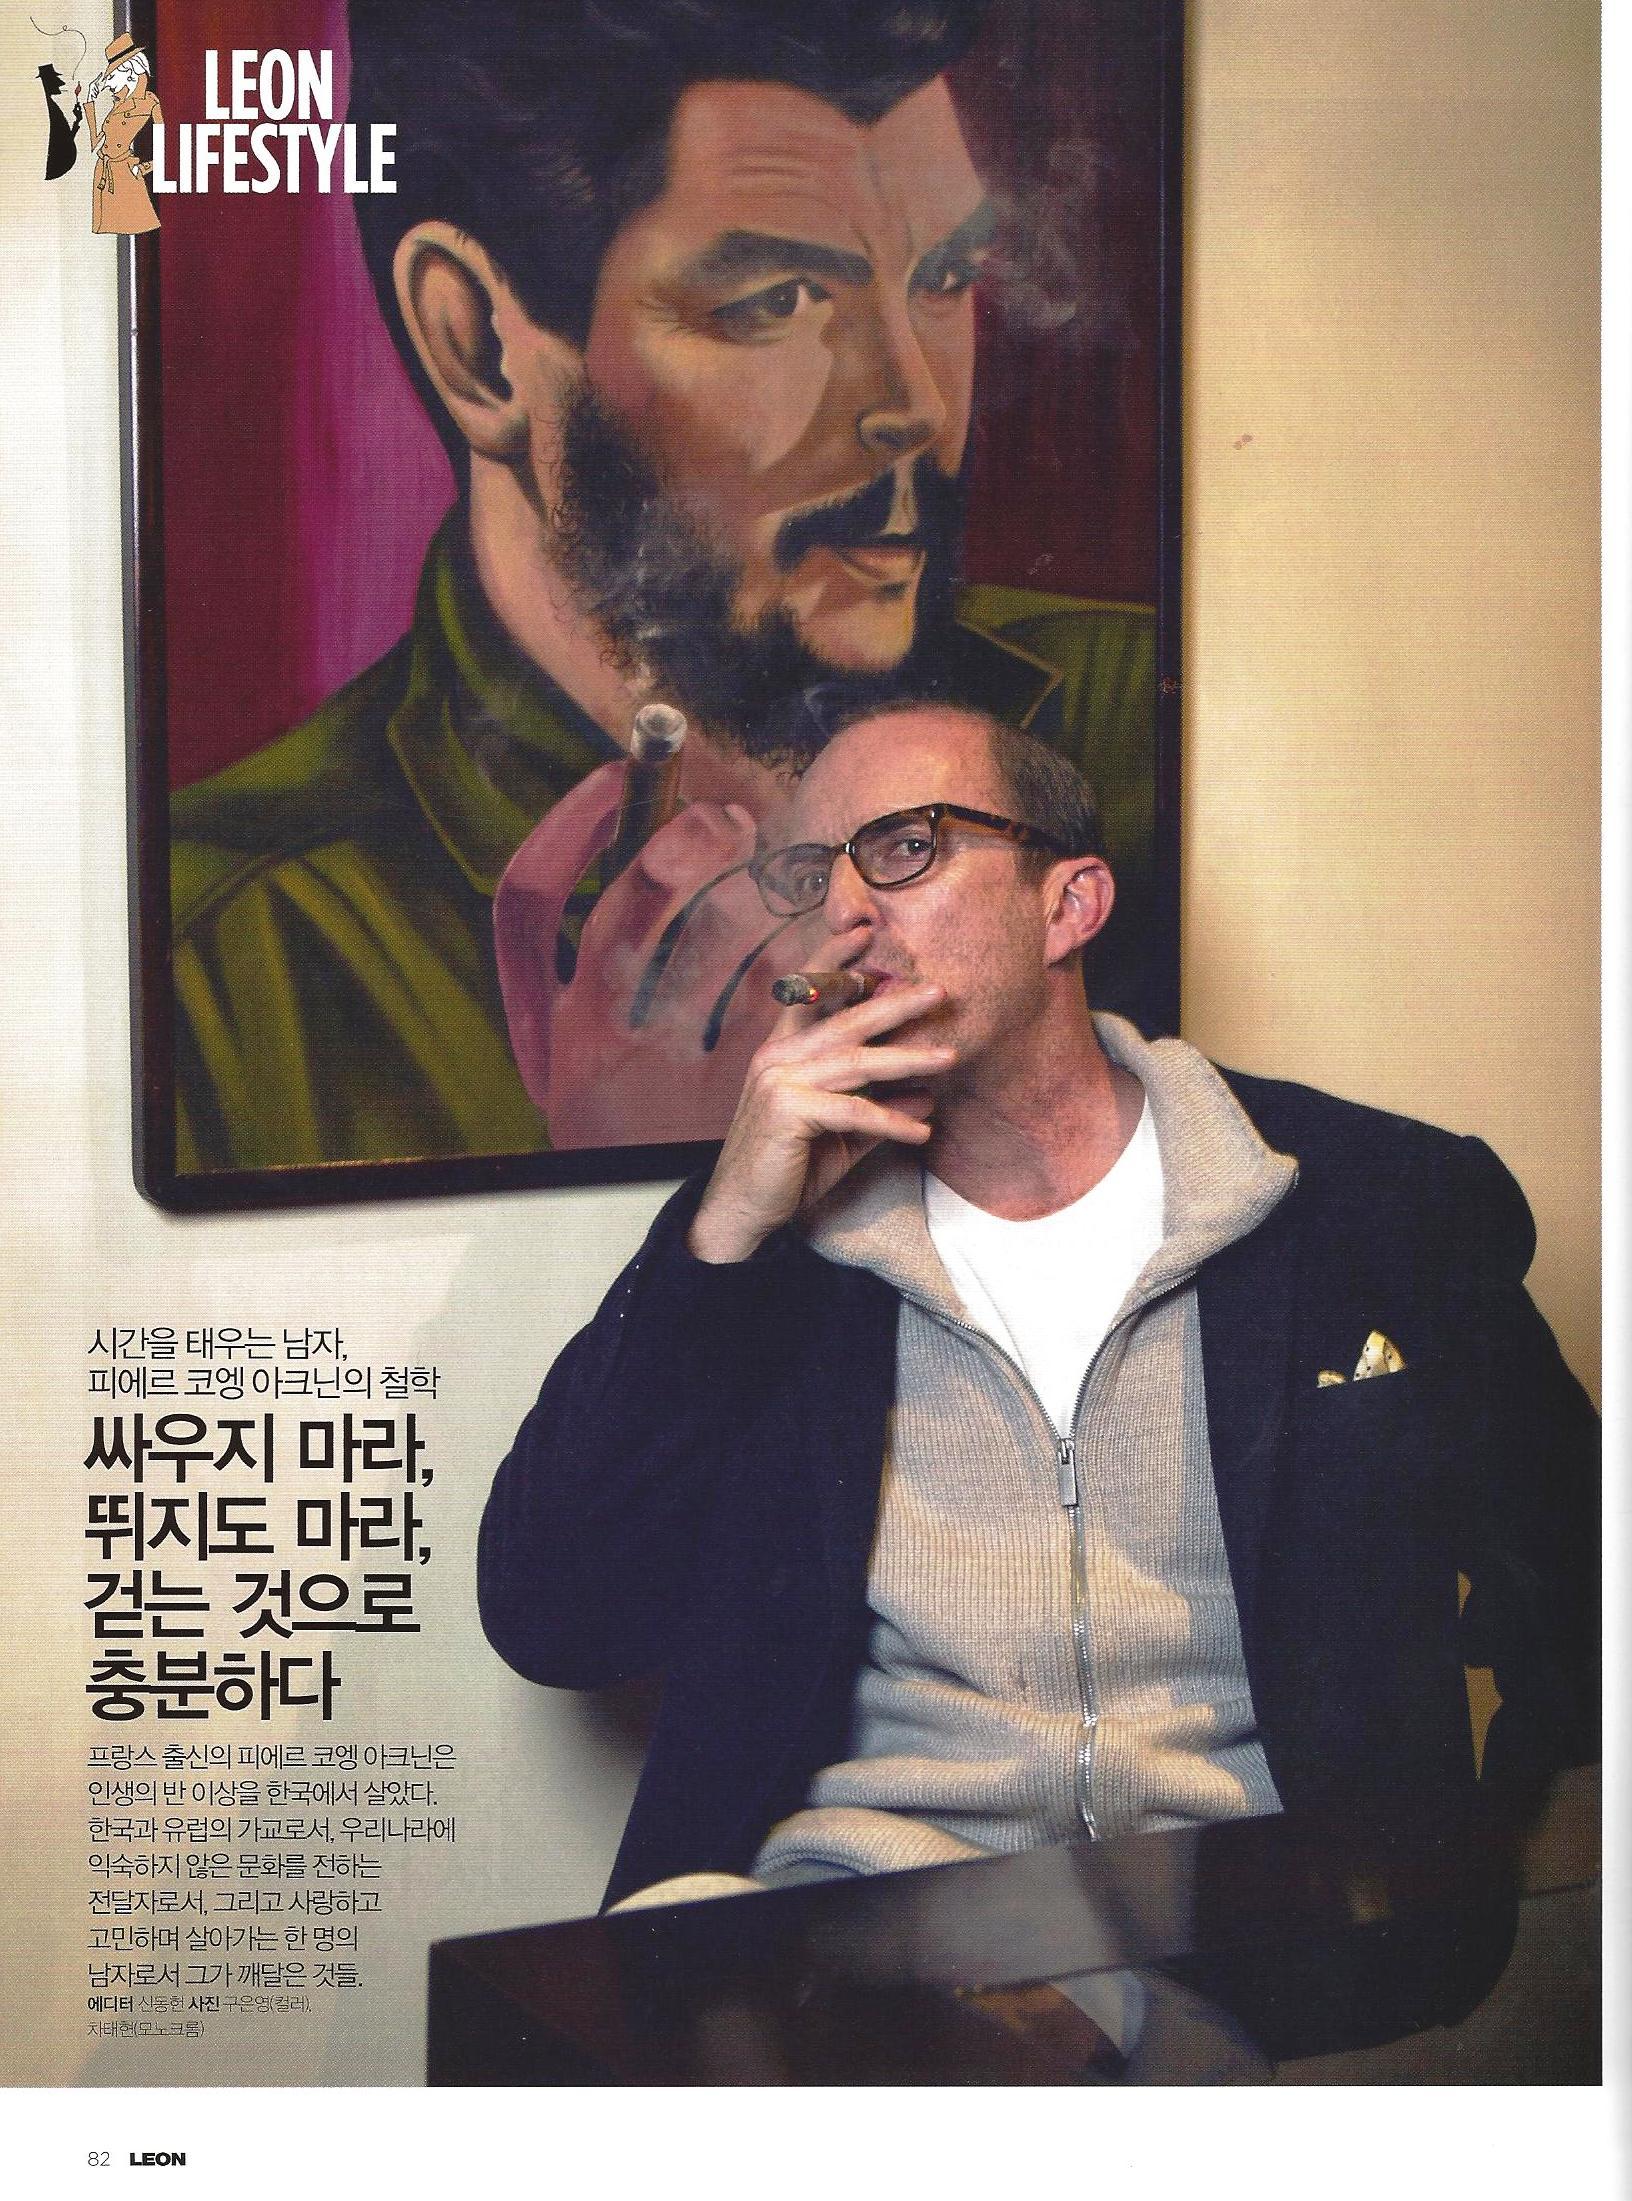 2012-3 Leon article 1.jpg